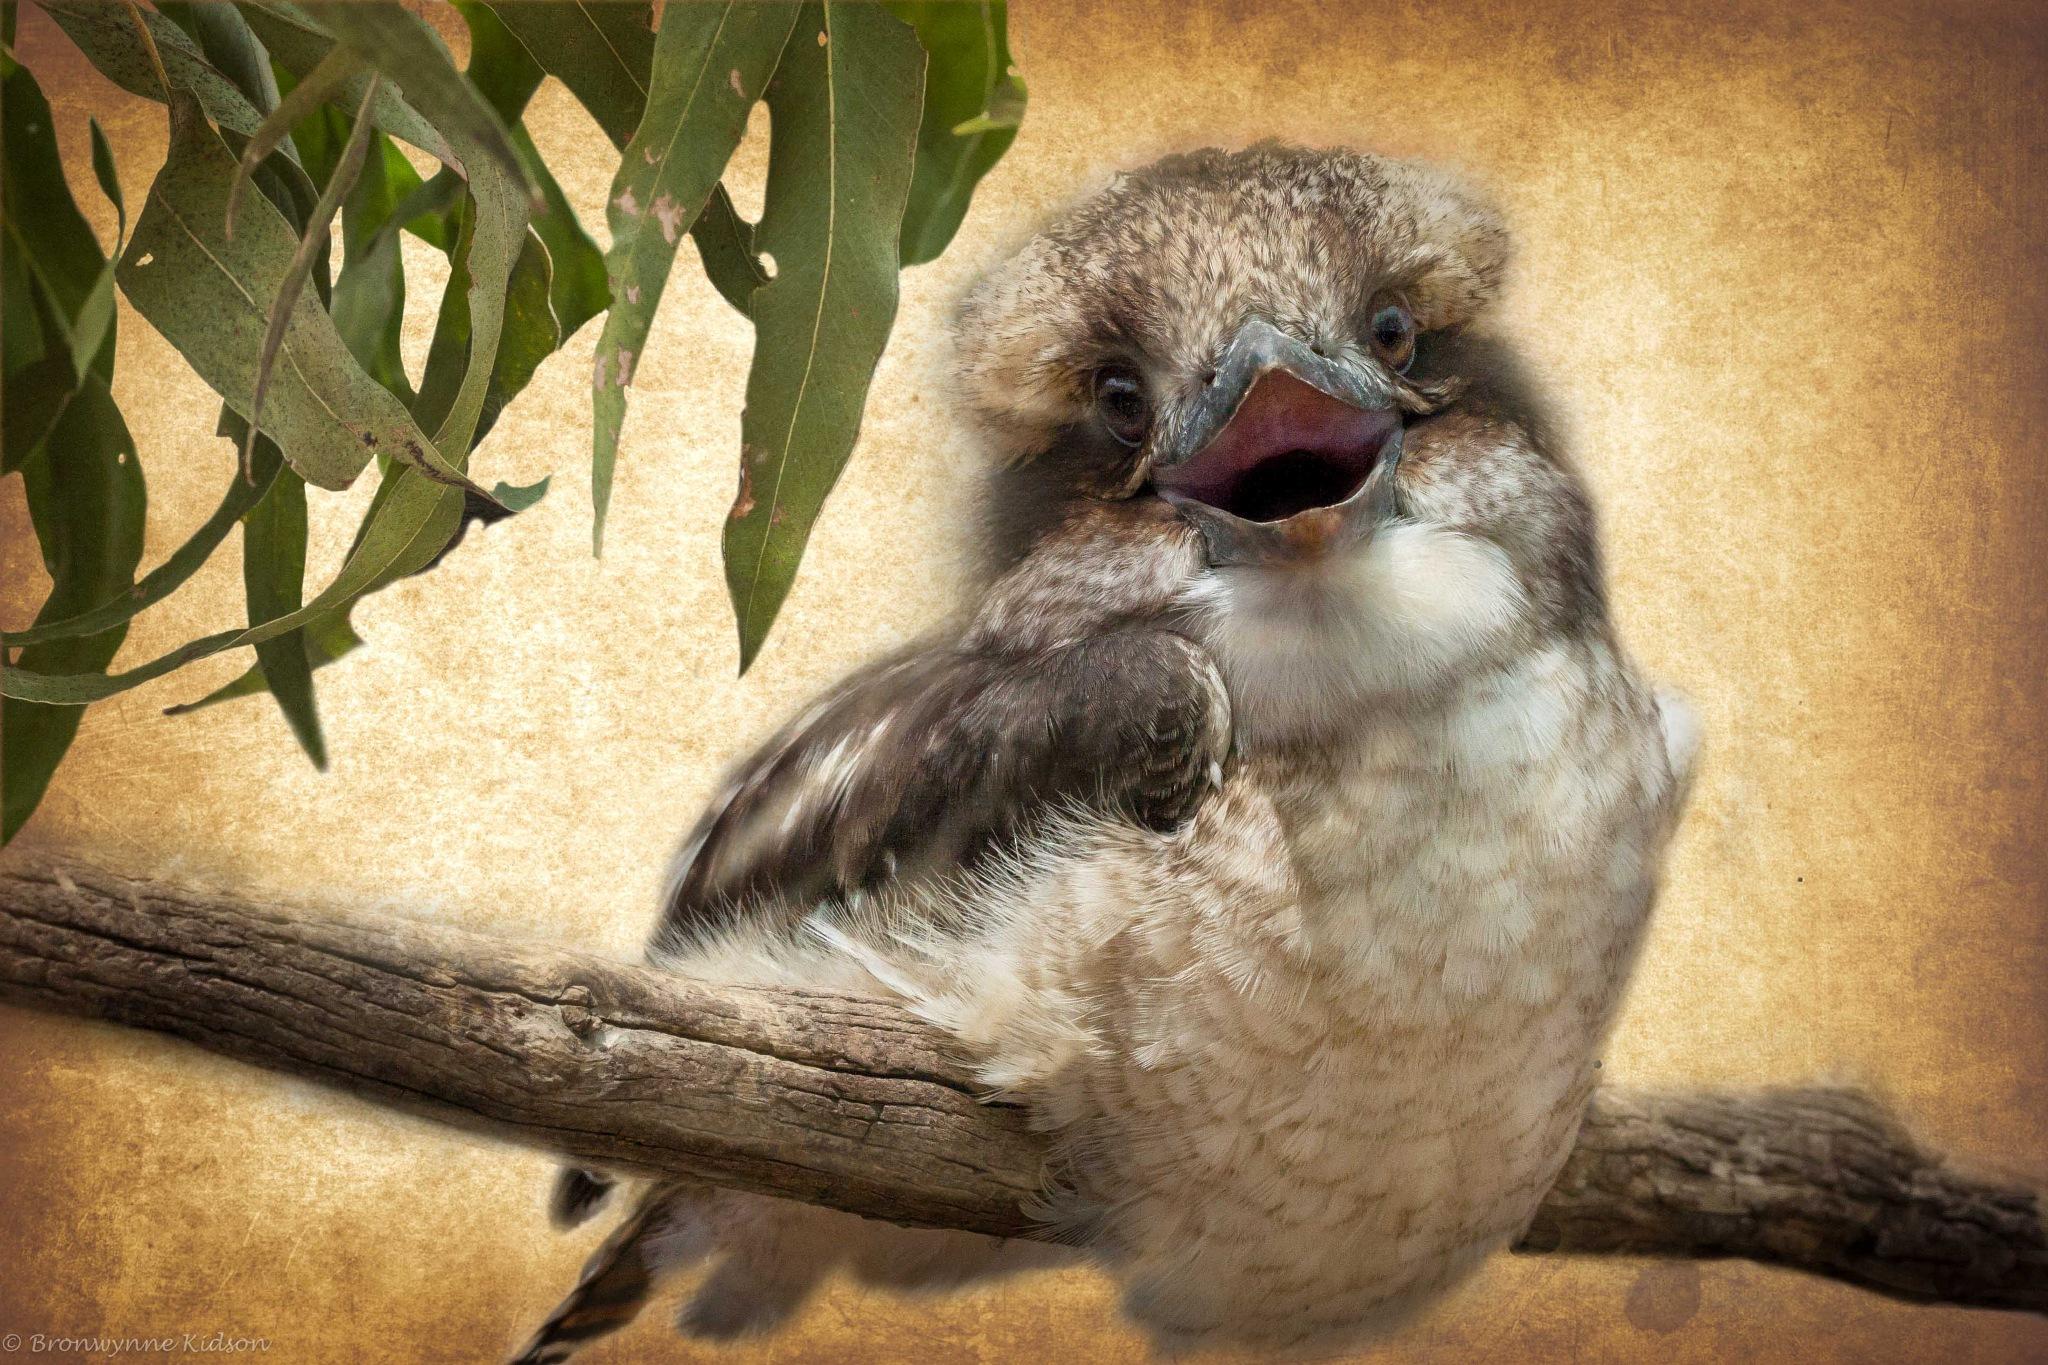 Kookaburra Laugh by Bronwynne Kidson